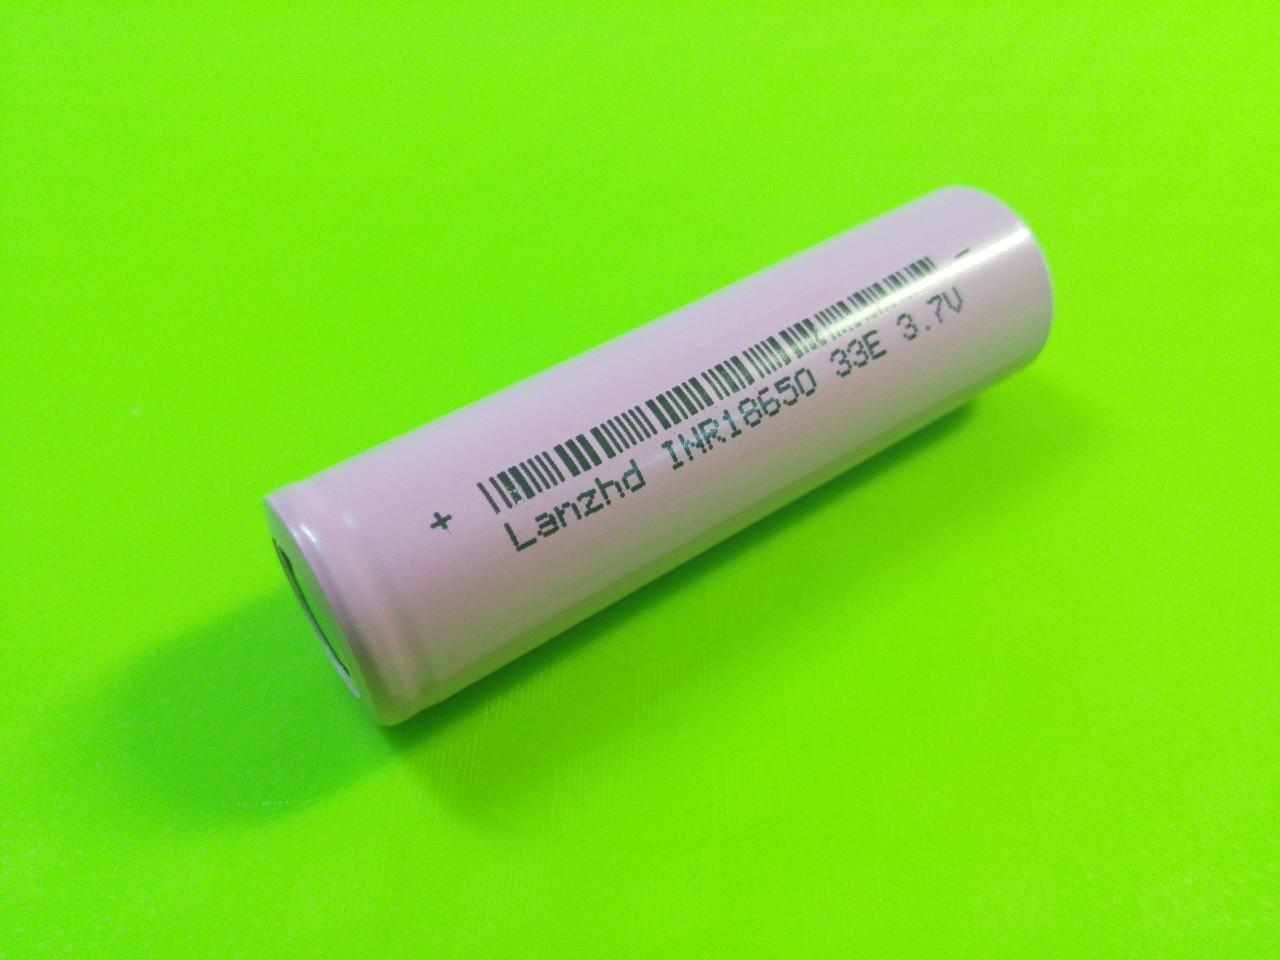 Аккумулятор INR18650 LanzHD Li-ion 3300 мАч качество гарантирует производитель